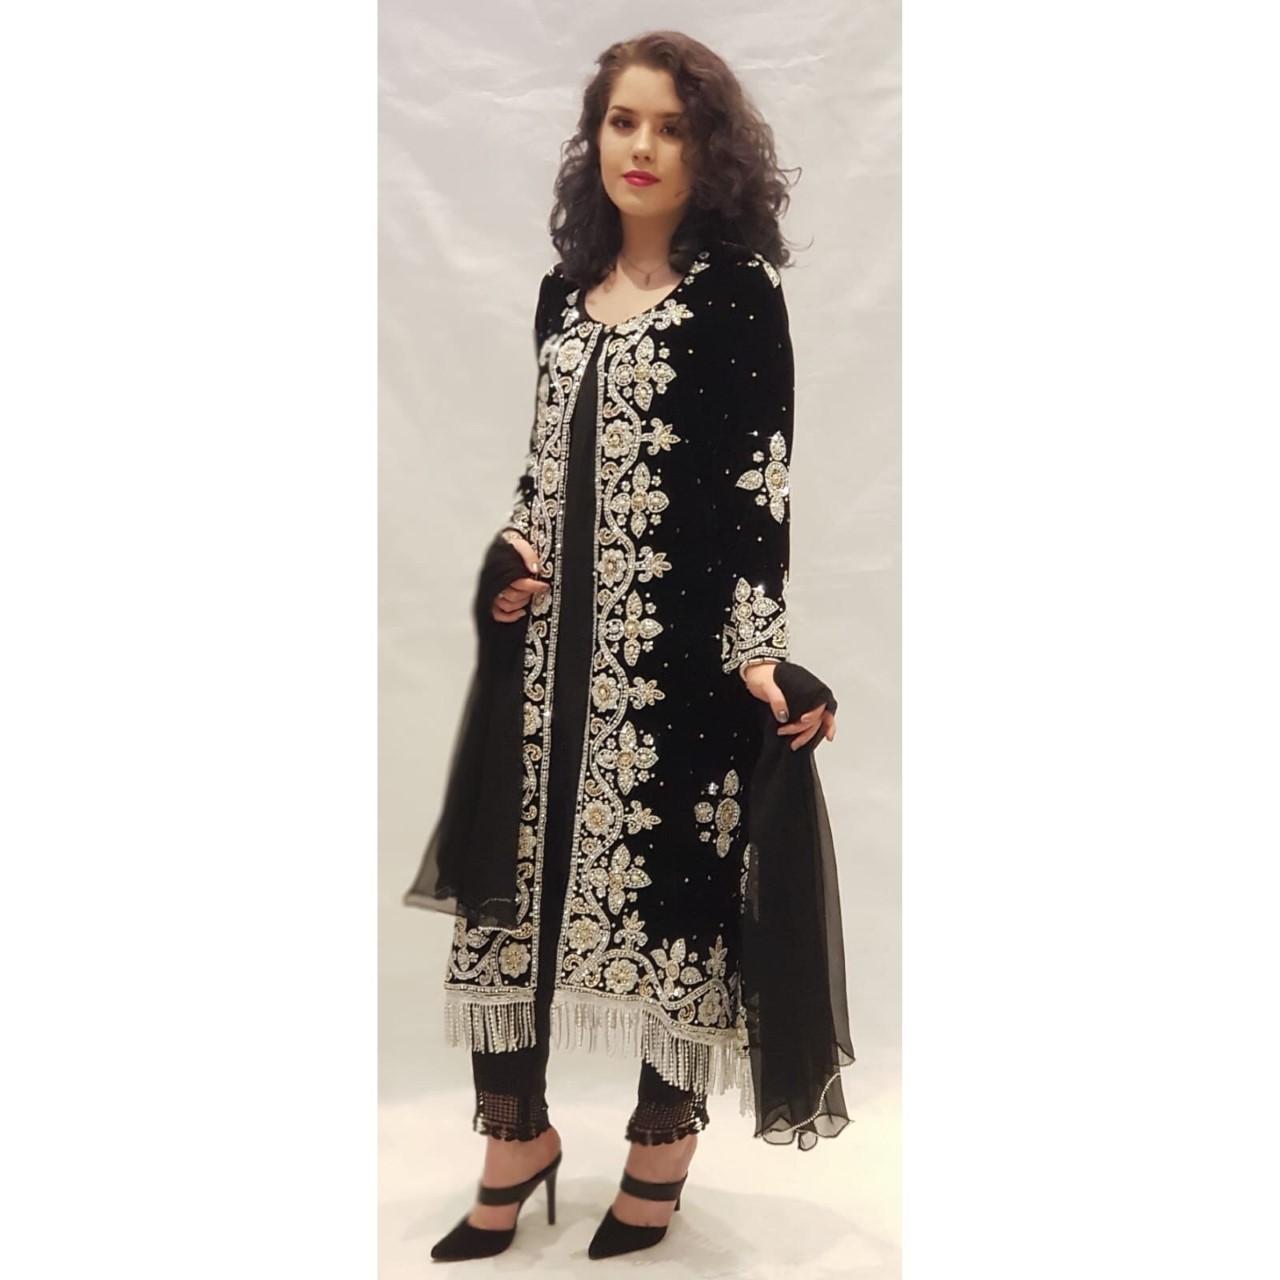 068f476f8f Black Velvet Jacket Dress - Sarah Zaaraz London Fashion Designer    Pakistani Dress Designer   Bridal Dresses